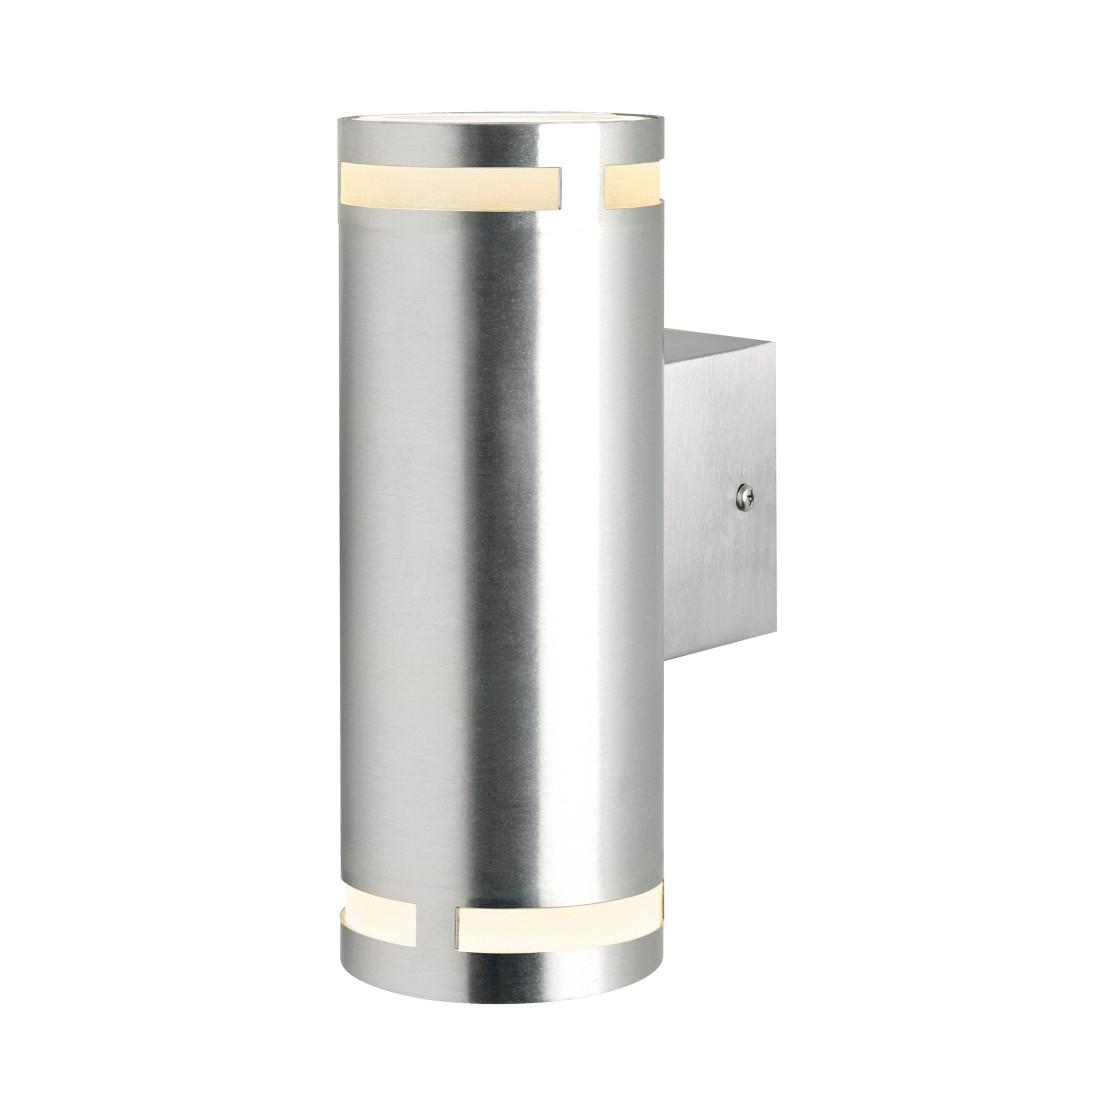 EEK A++, Wandstrahler 2-seitig Can Maxi II – Aluminium, Nordlux günstig online kaufen